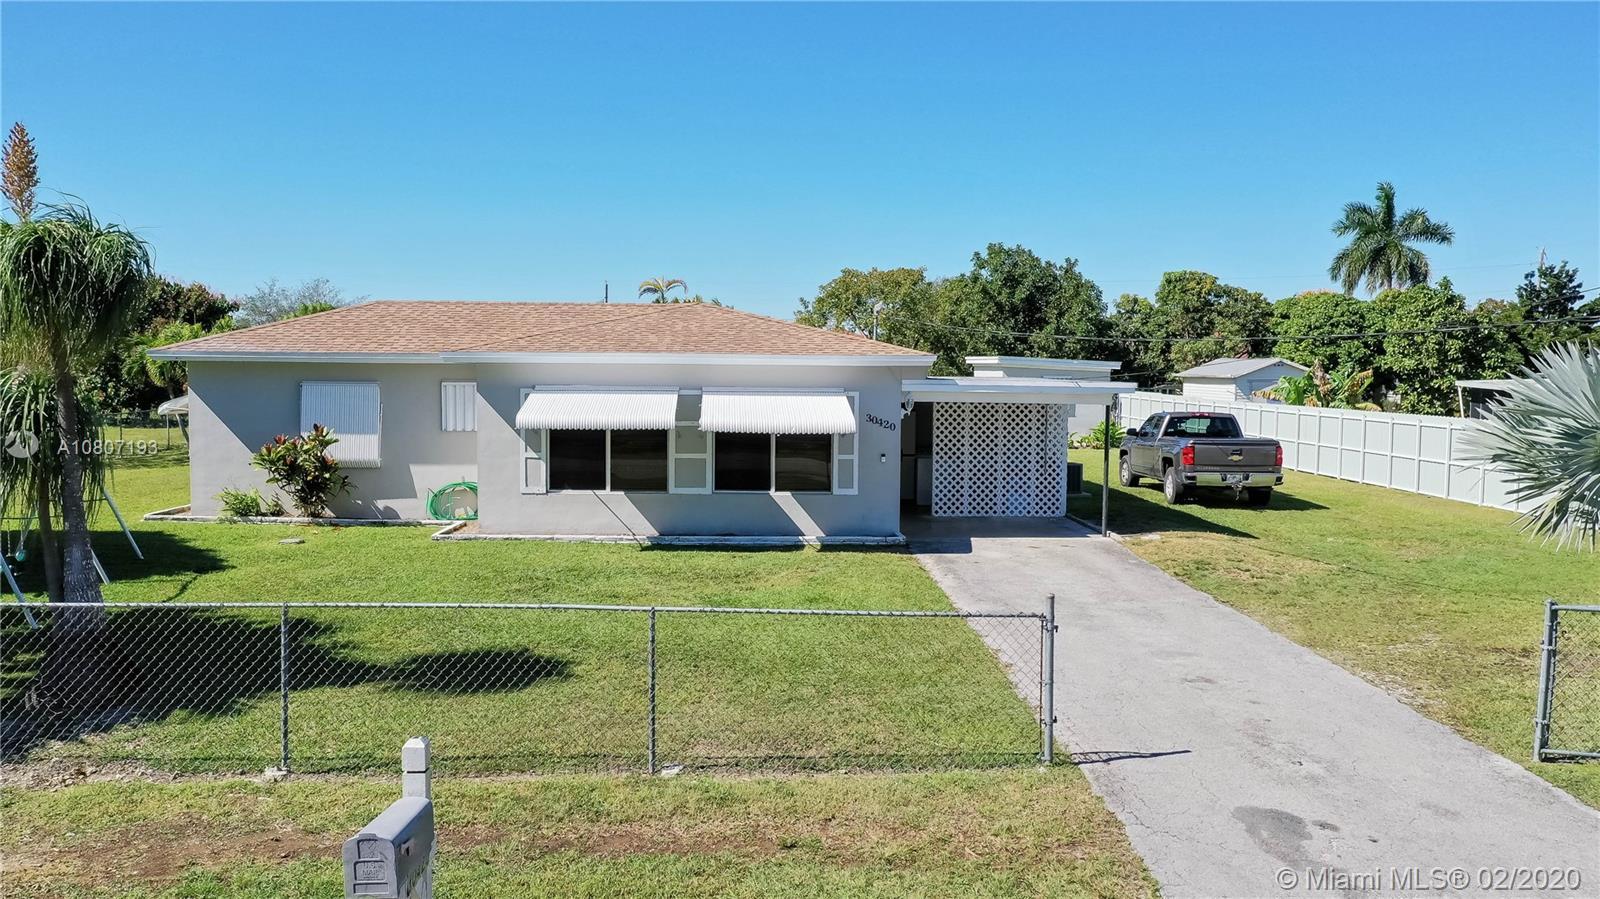 30420 SW 193 Ct, Homestead, FL 33030 - Homestead, FL real estate listing